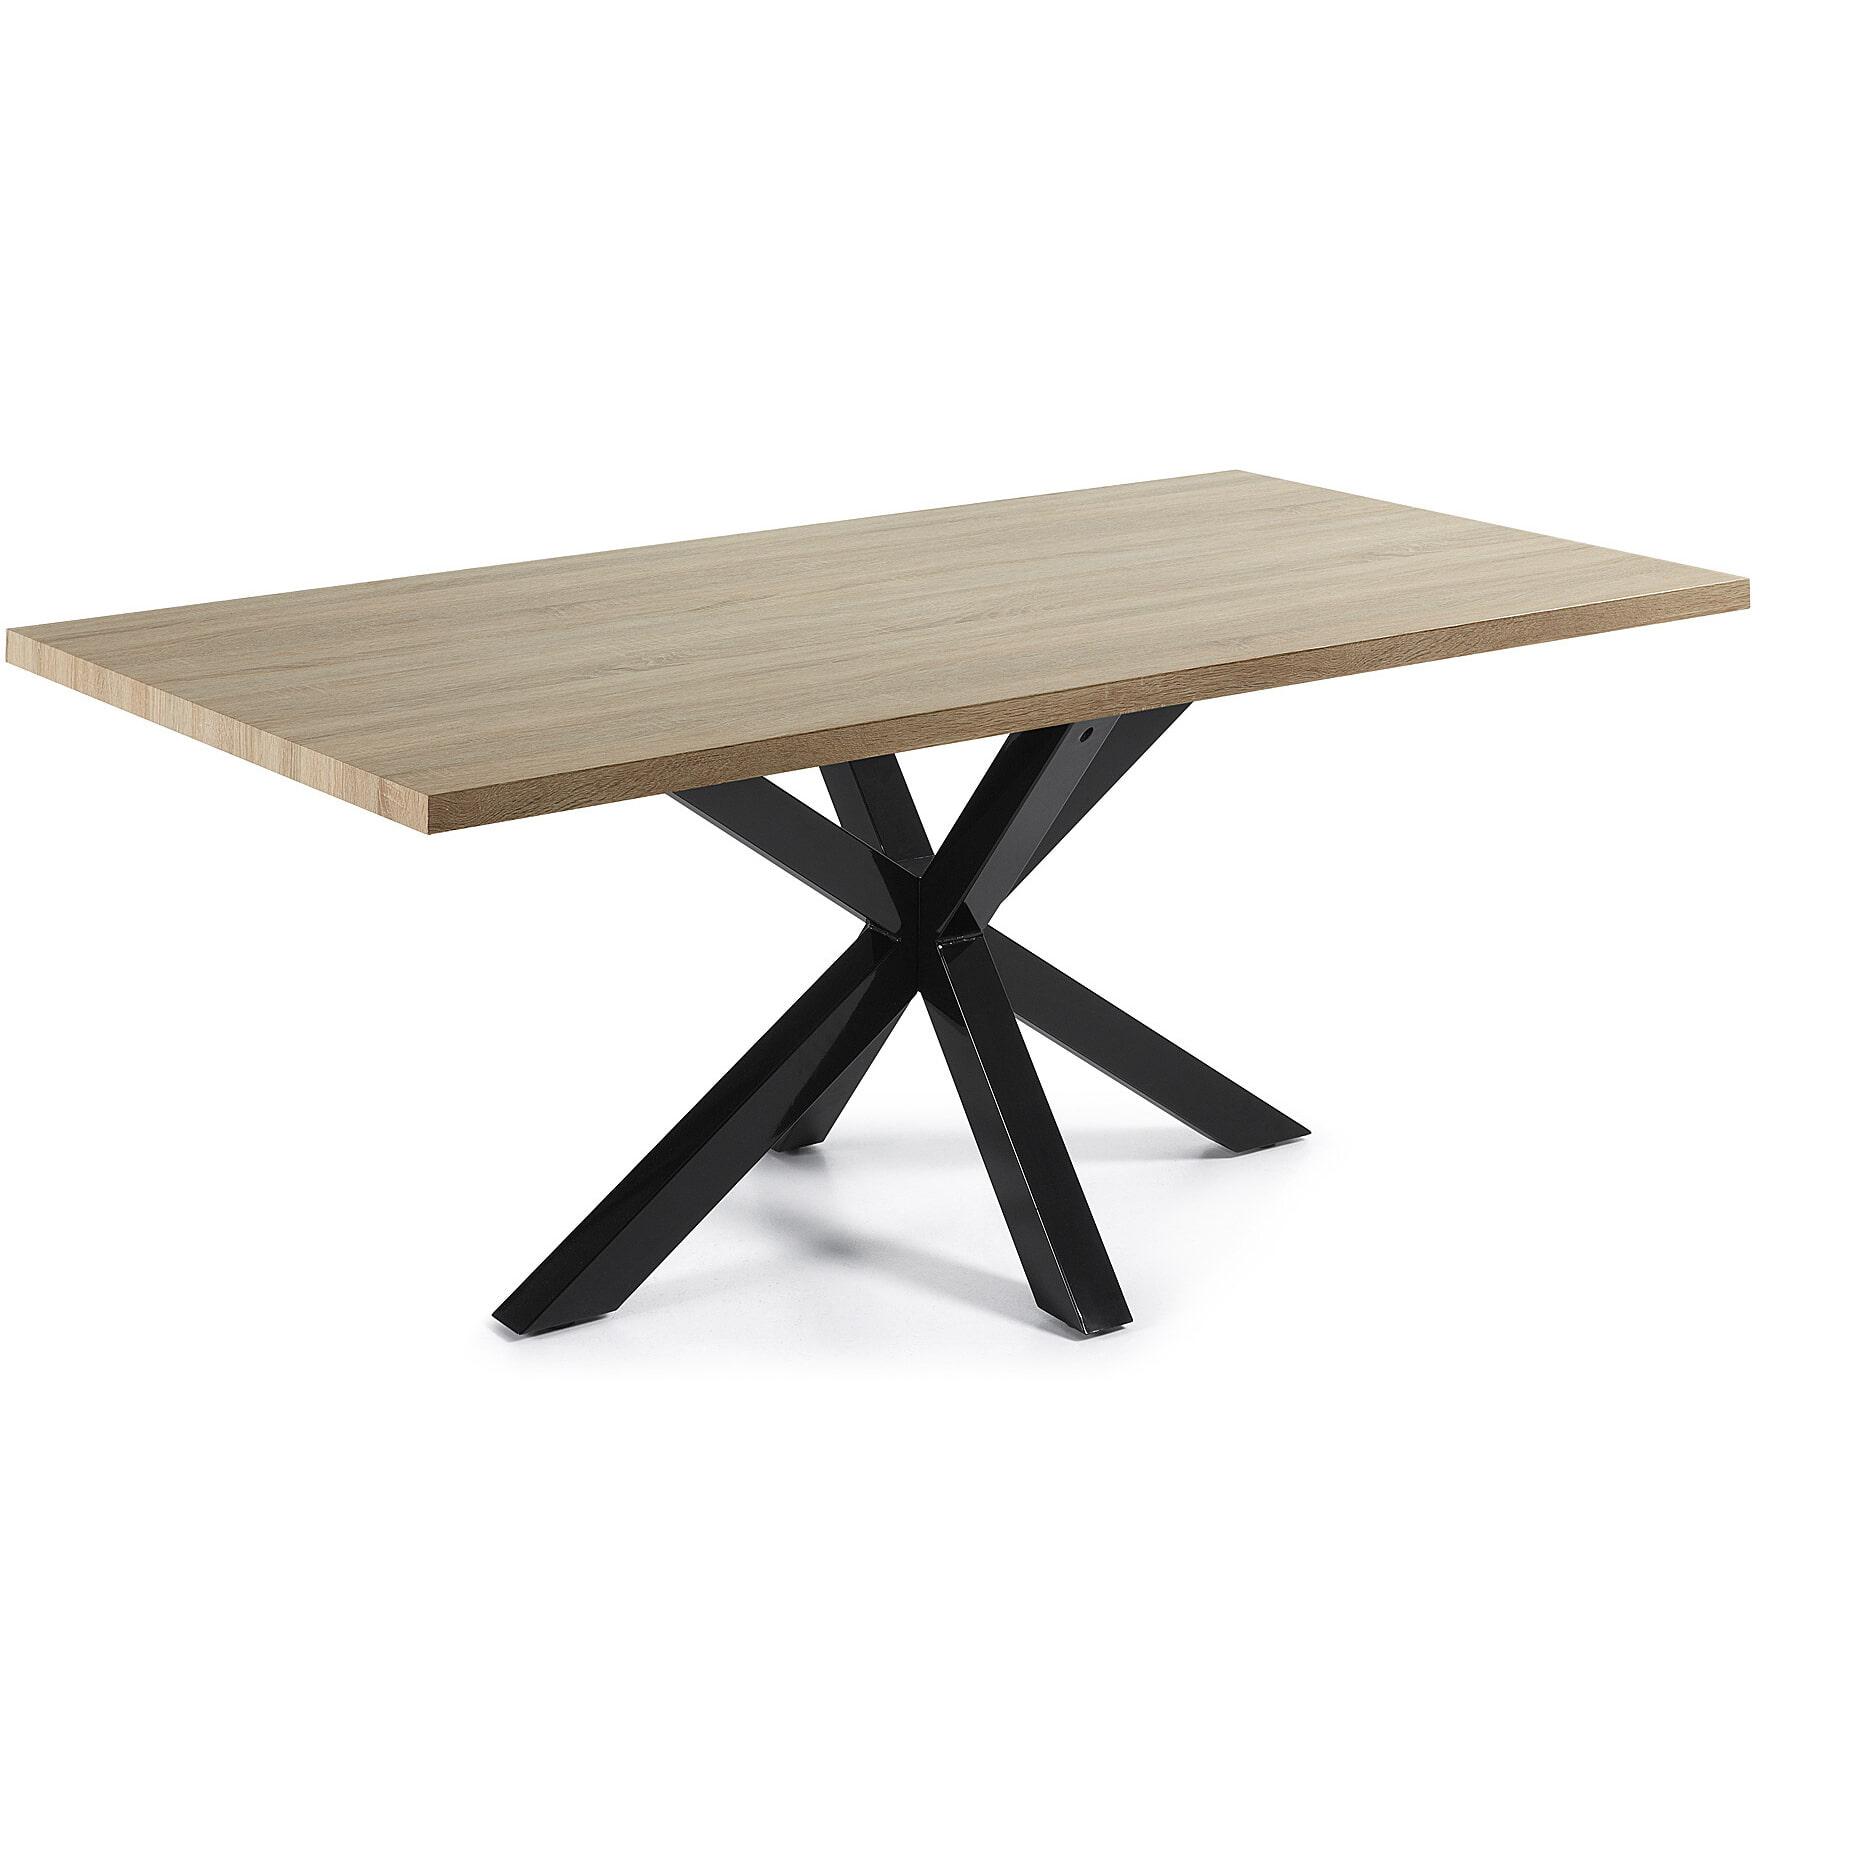 Kave Home Eettafel 'Argo' zwart - hout, 200 x 100cm